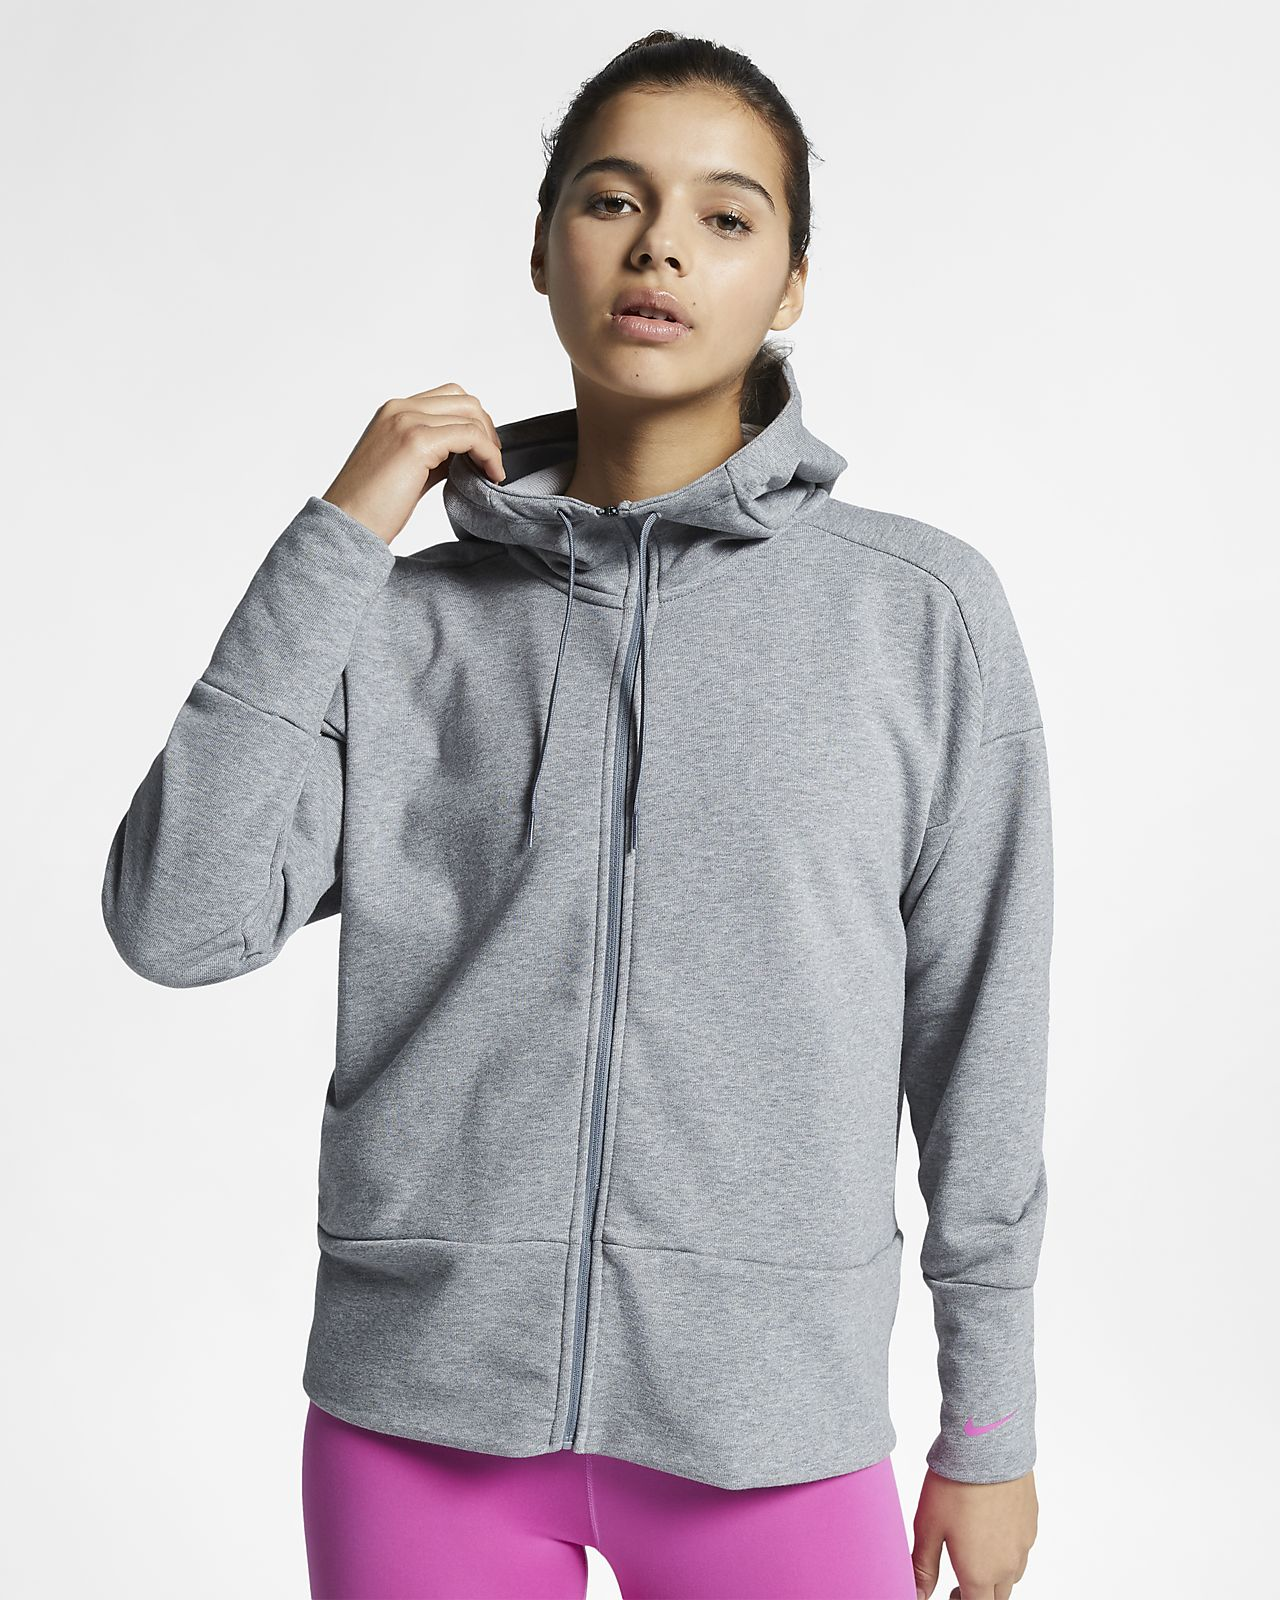 Nike Dri-FIT hosszú cipzáras, hosszú ujjú kapucnis női pulóver